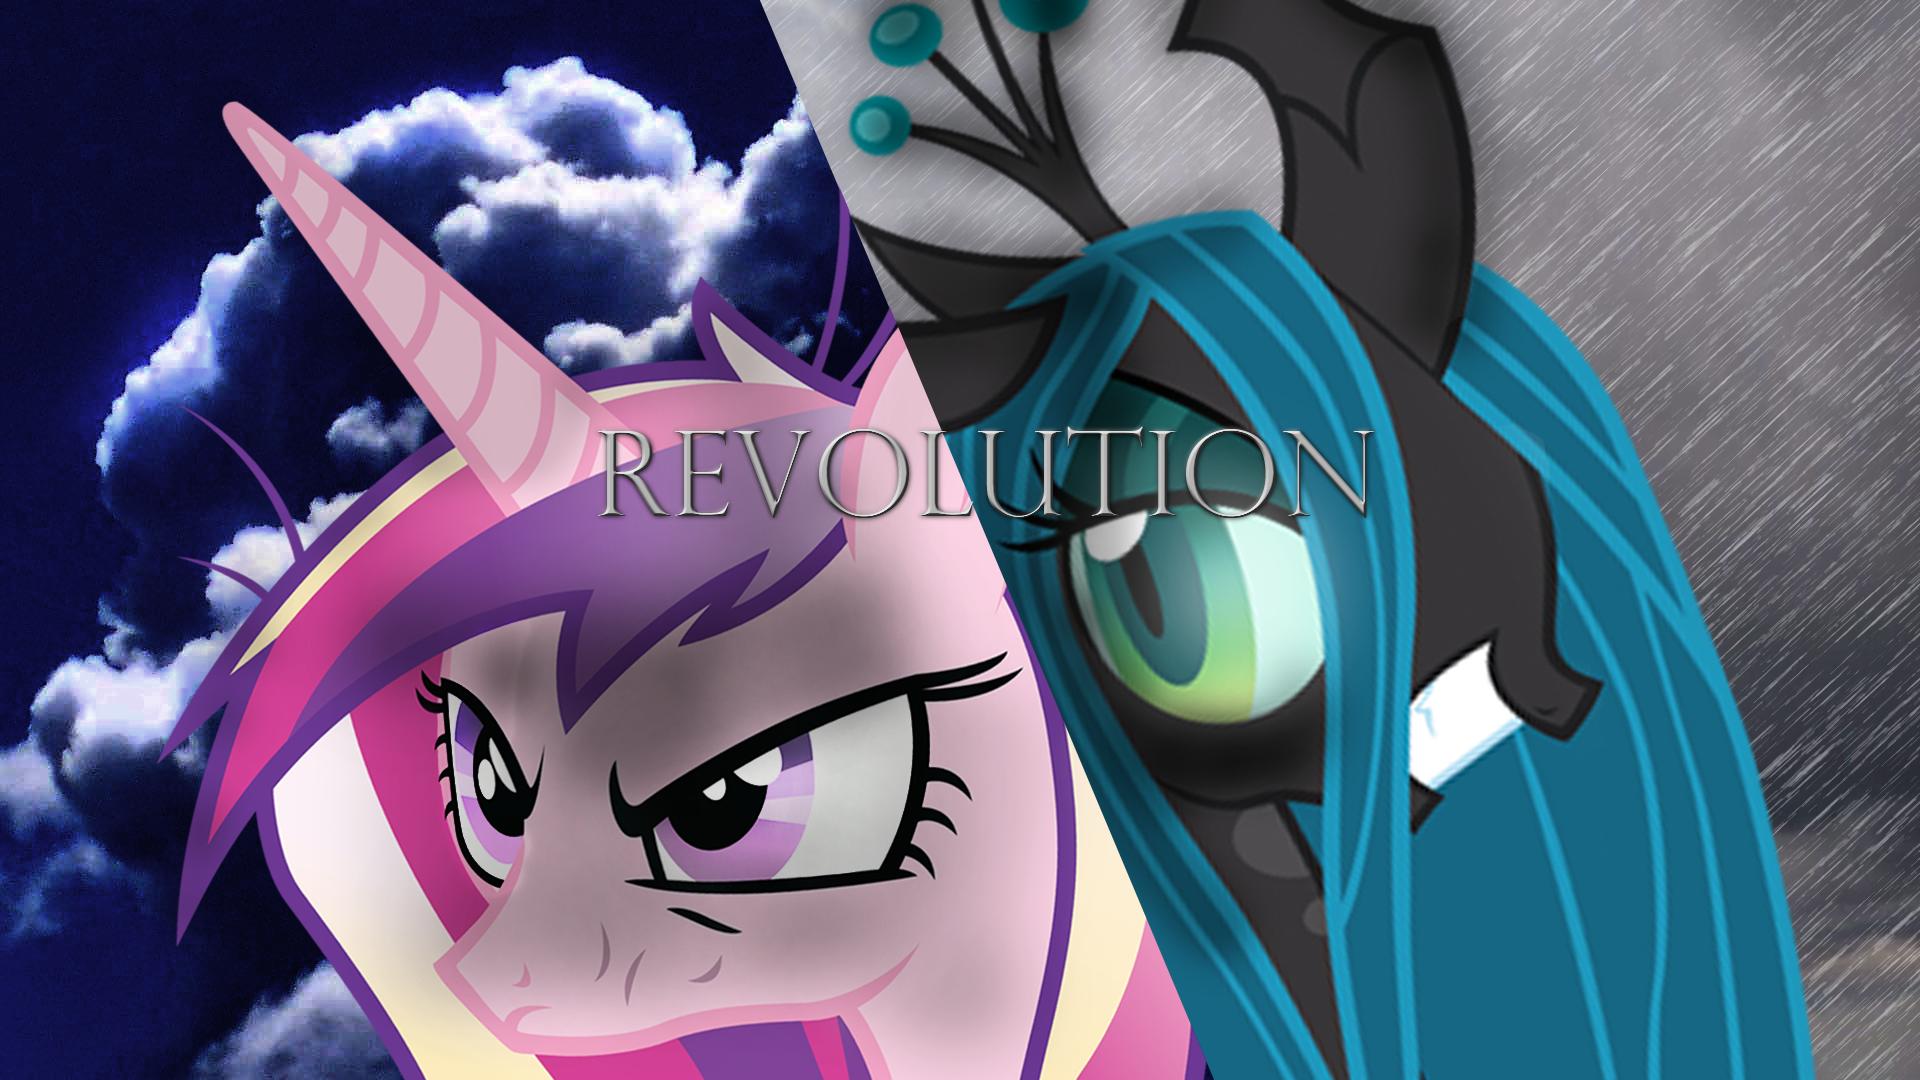 Princess Cadence VS Queen Chrysalis 2 by Blackm3sh, ElmoDesigns and RainbowPlasma